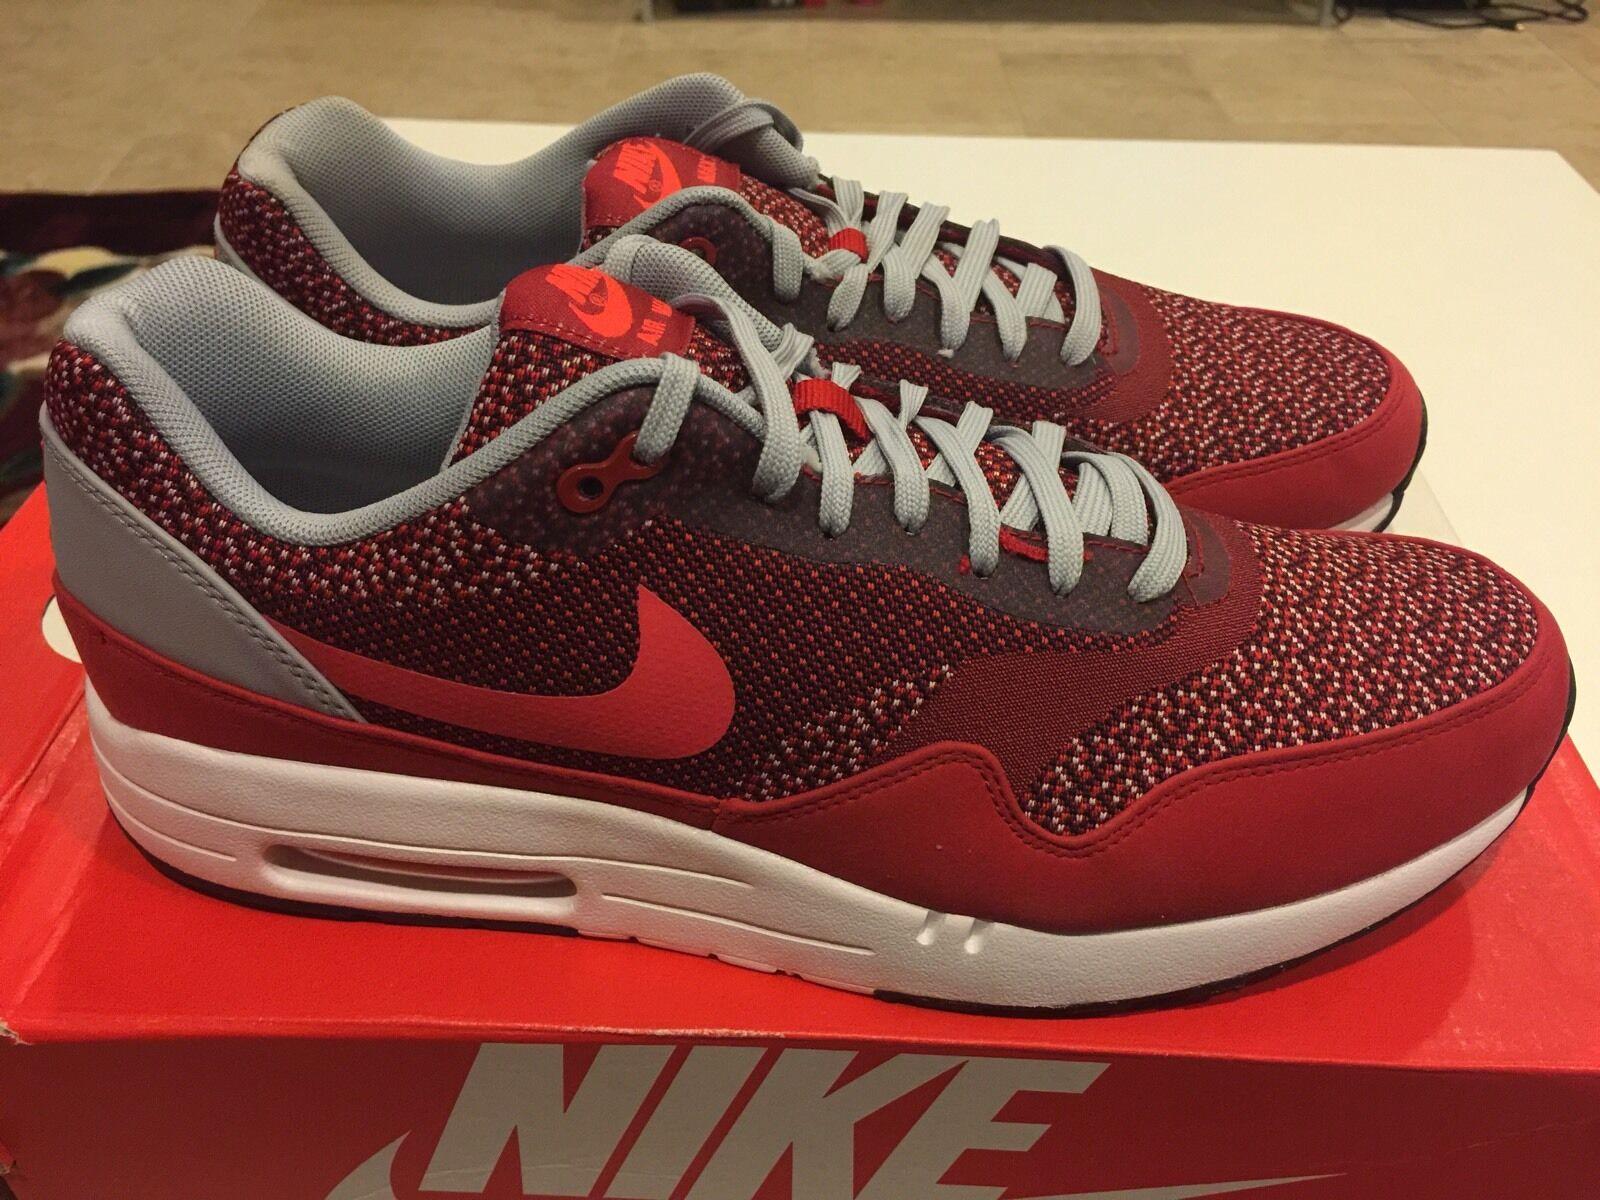 Nike Air Max 1 JCRD Gym Red Laser Crimson [644153 600] Size 10.5